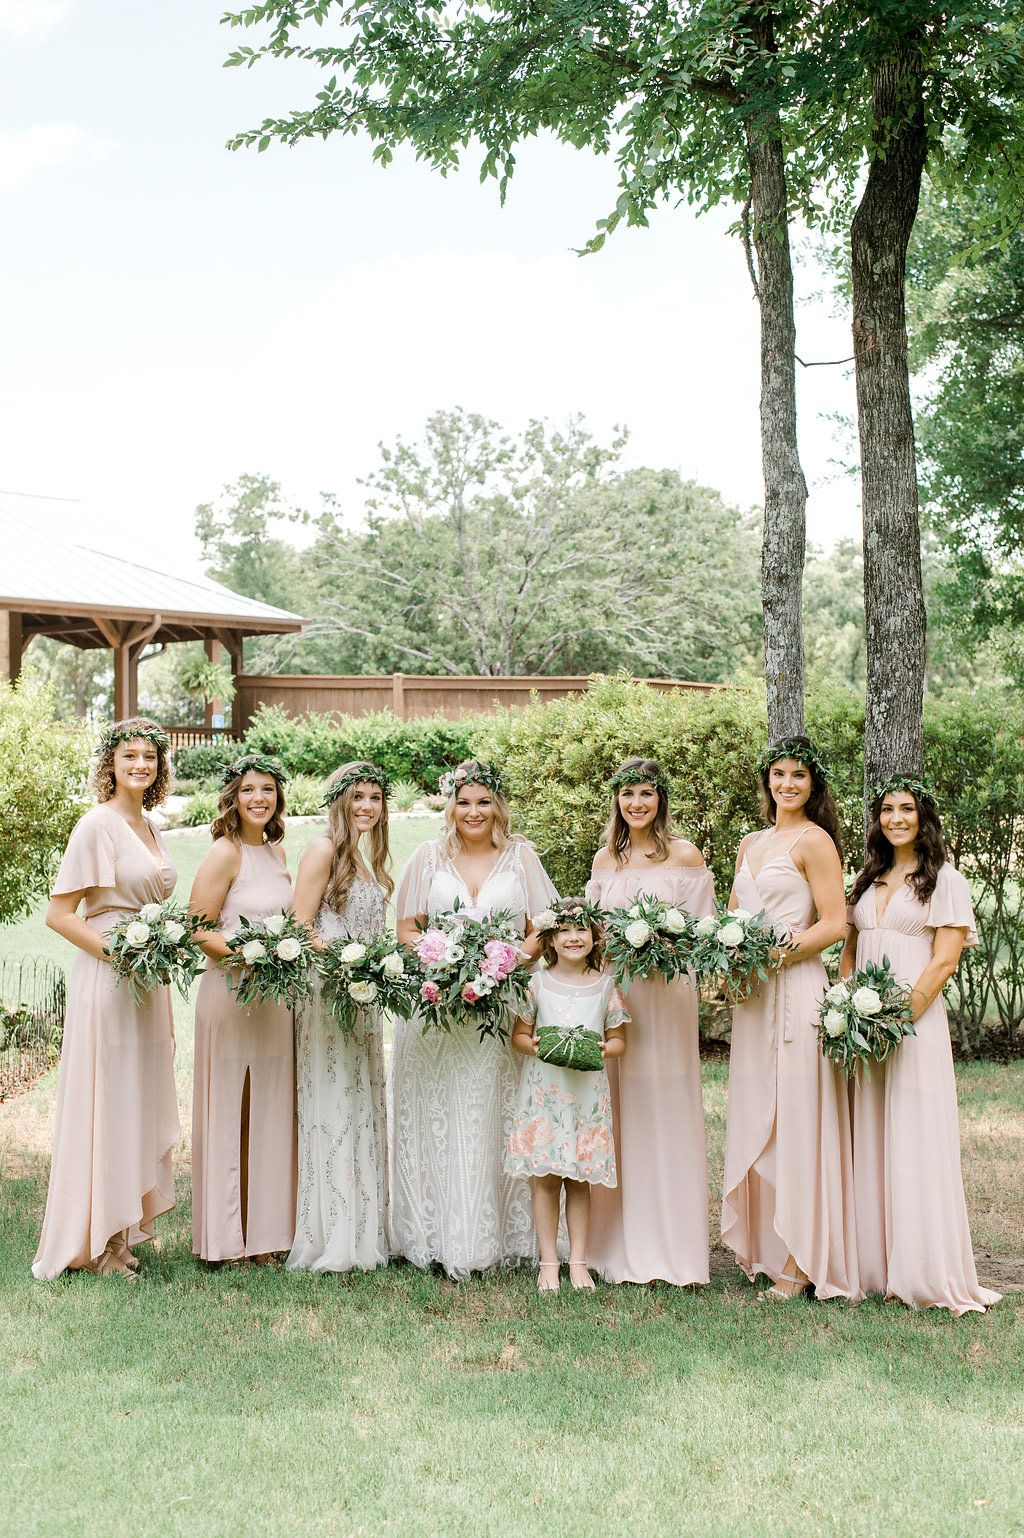 Blush Pink Bohemian Bridesmaids Long Blush Pink Boho Bridesmaid Dresses Outdoor Wedding Bohemian Wedding Flowers Bohemian Bridesmaid Bridesmaid Flowers